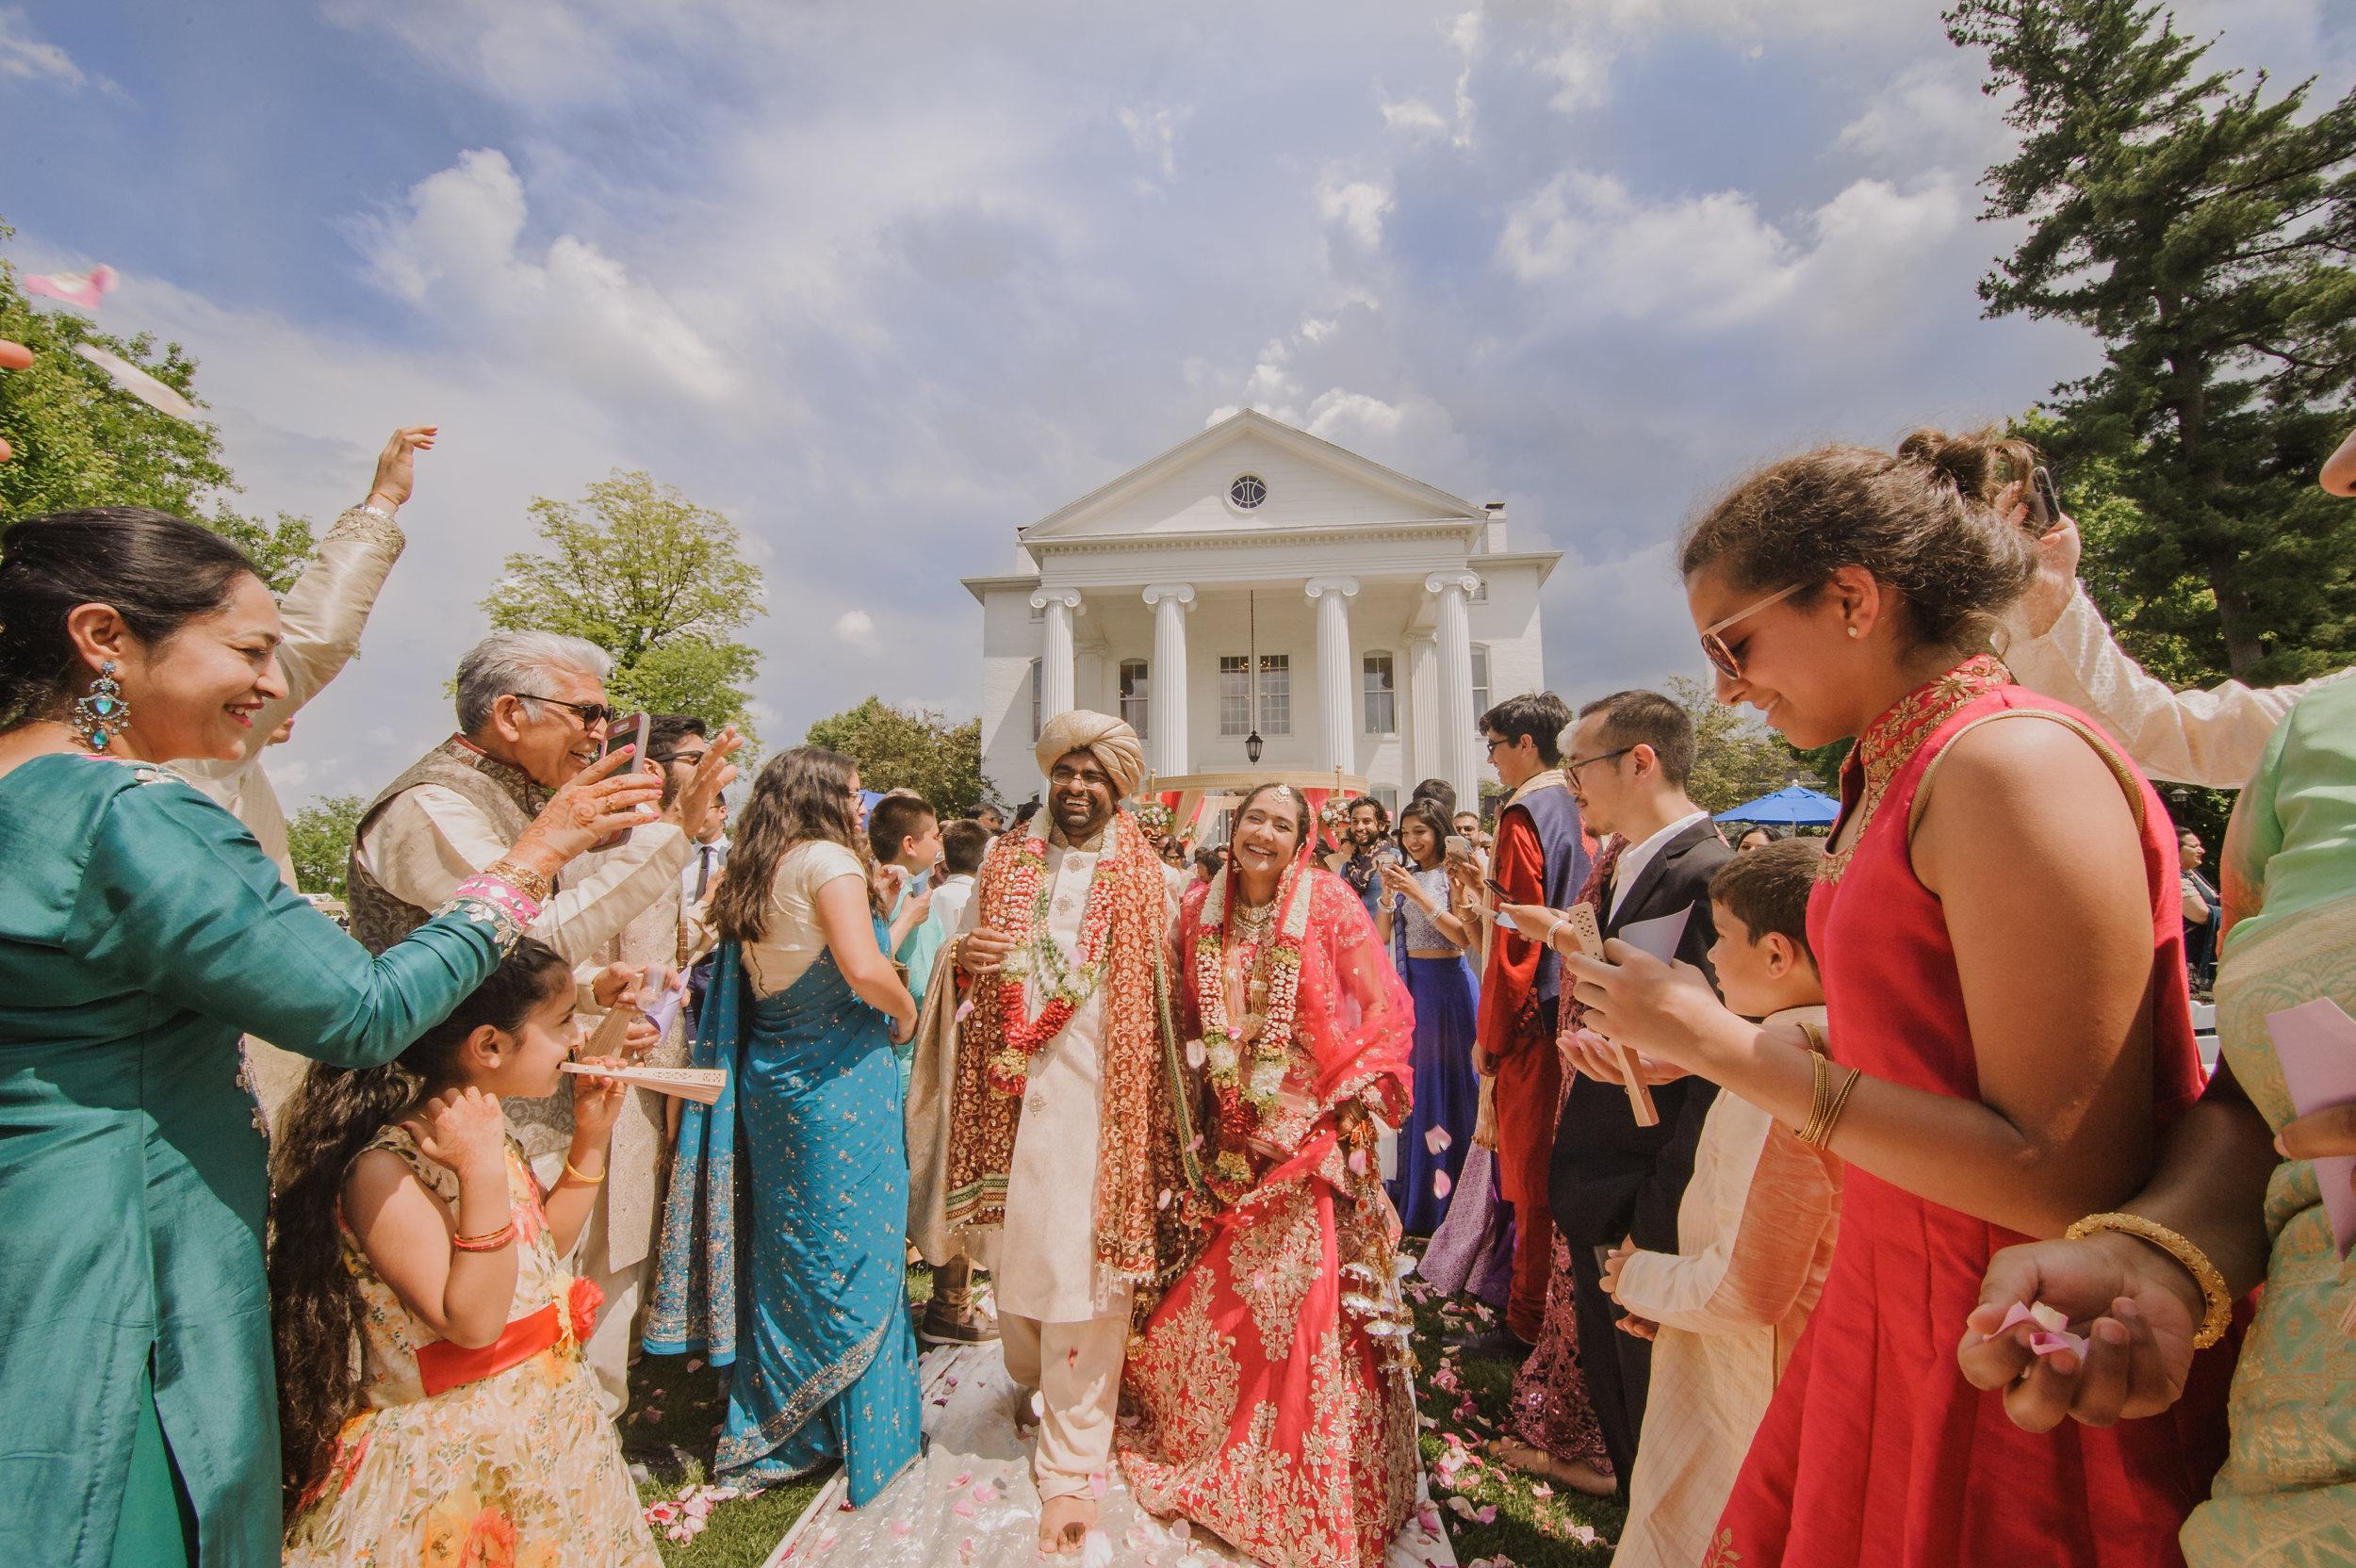 BEST MIAMI FLORIDA BROWARD Dulhan HENNA BRIDE SOUTH ASIAN HINDI HINDU PUNJABI PHOTOGRAPHER VIDEO SAREE Vatna Maiyan Chuda Sangeet Mehndi Jago BARAAT PHERAS Desh Videsh Sabyasachi Jhumka KUNDAN Jadau MARIGOLD FLOWERS Gajra Varmala MALA puja milni Ganesh Pooja Kanya Aagman Jai Mala Kanyadaan Agni Pooja Mangal Phera Saptapadi Sindhur Mangal Sutra Blessings